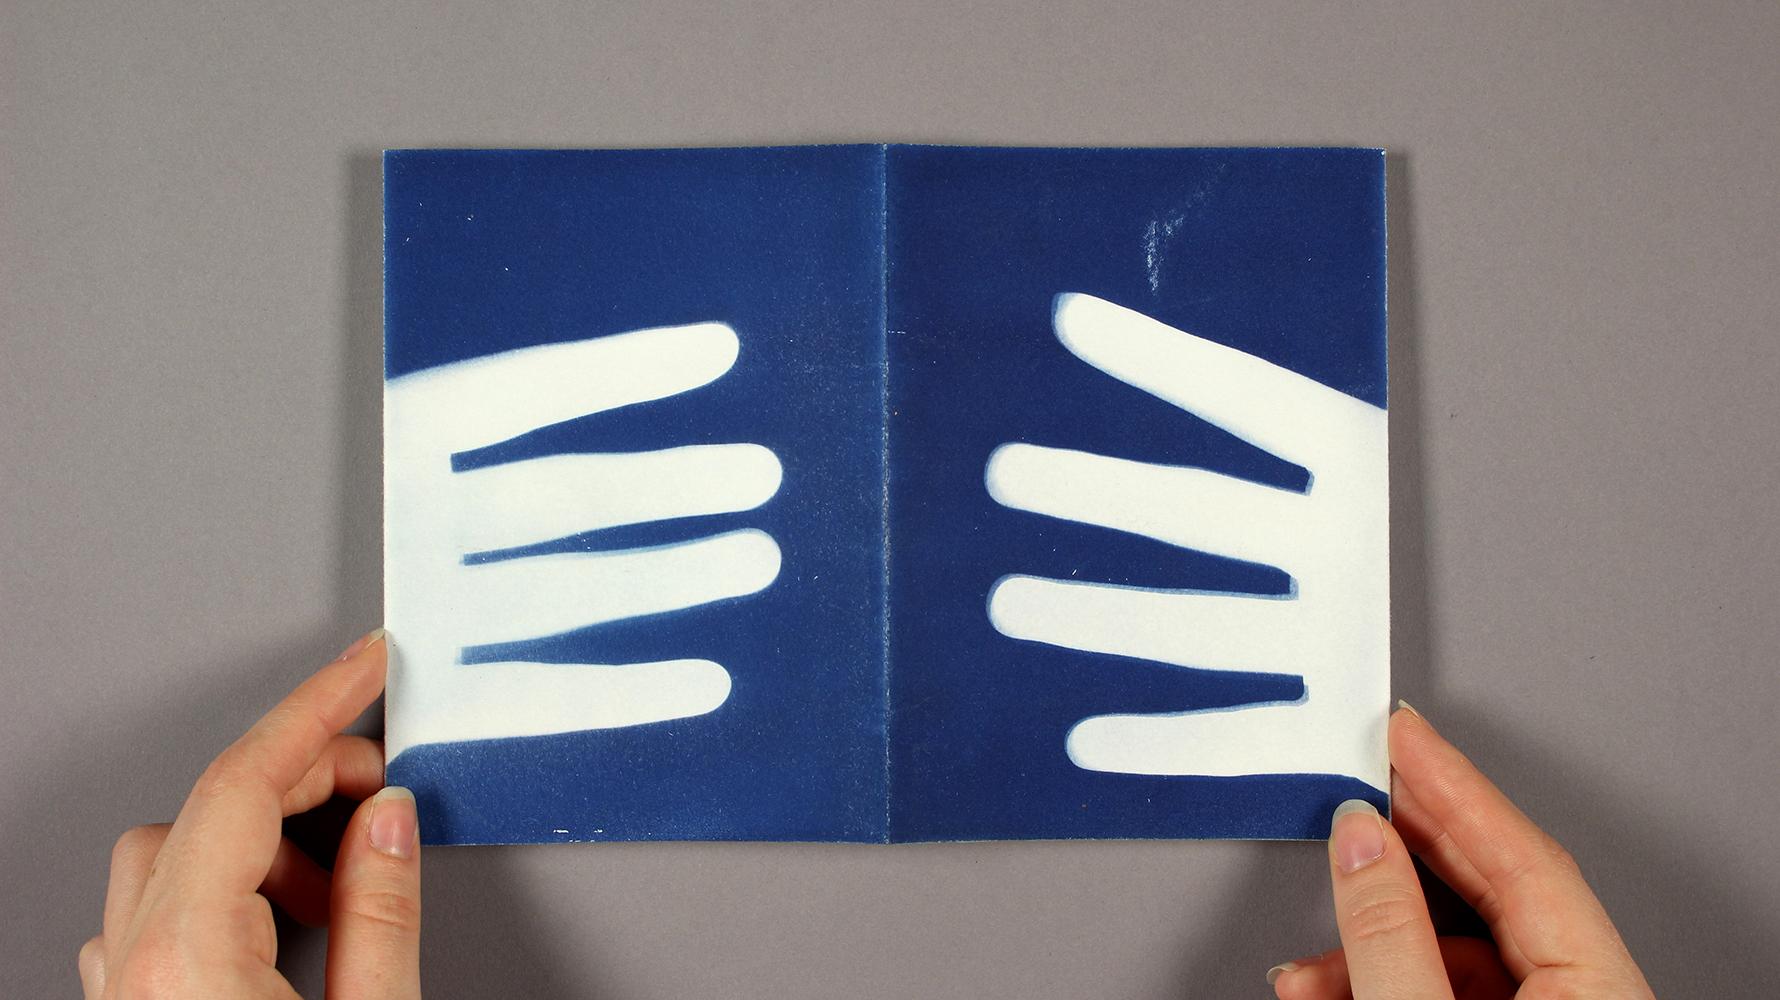 phoebe_nightingale_the_sun_will_set_into_my_palms_cyanotype_sun_print_paper_book_009.jpg